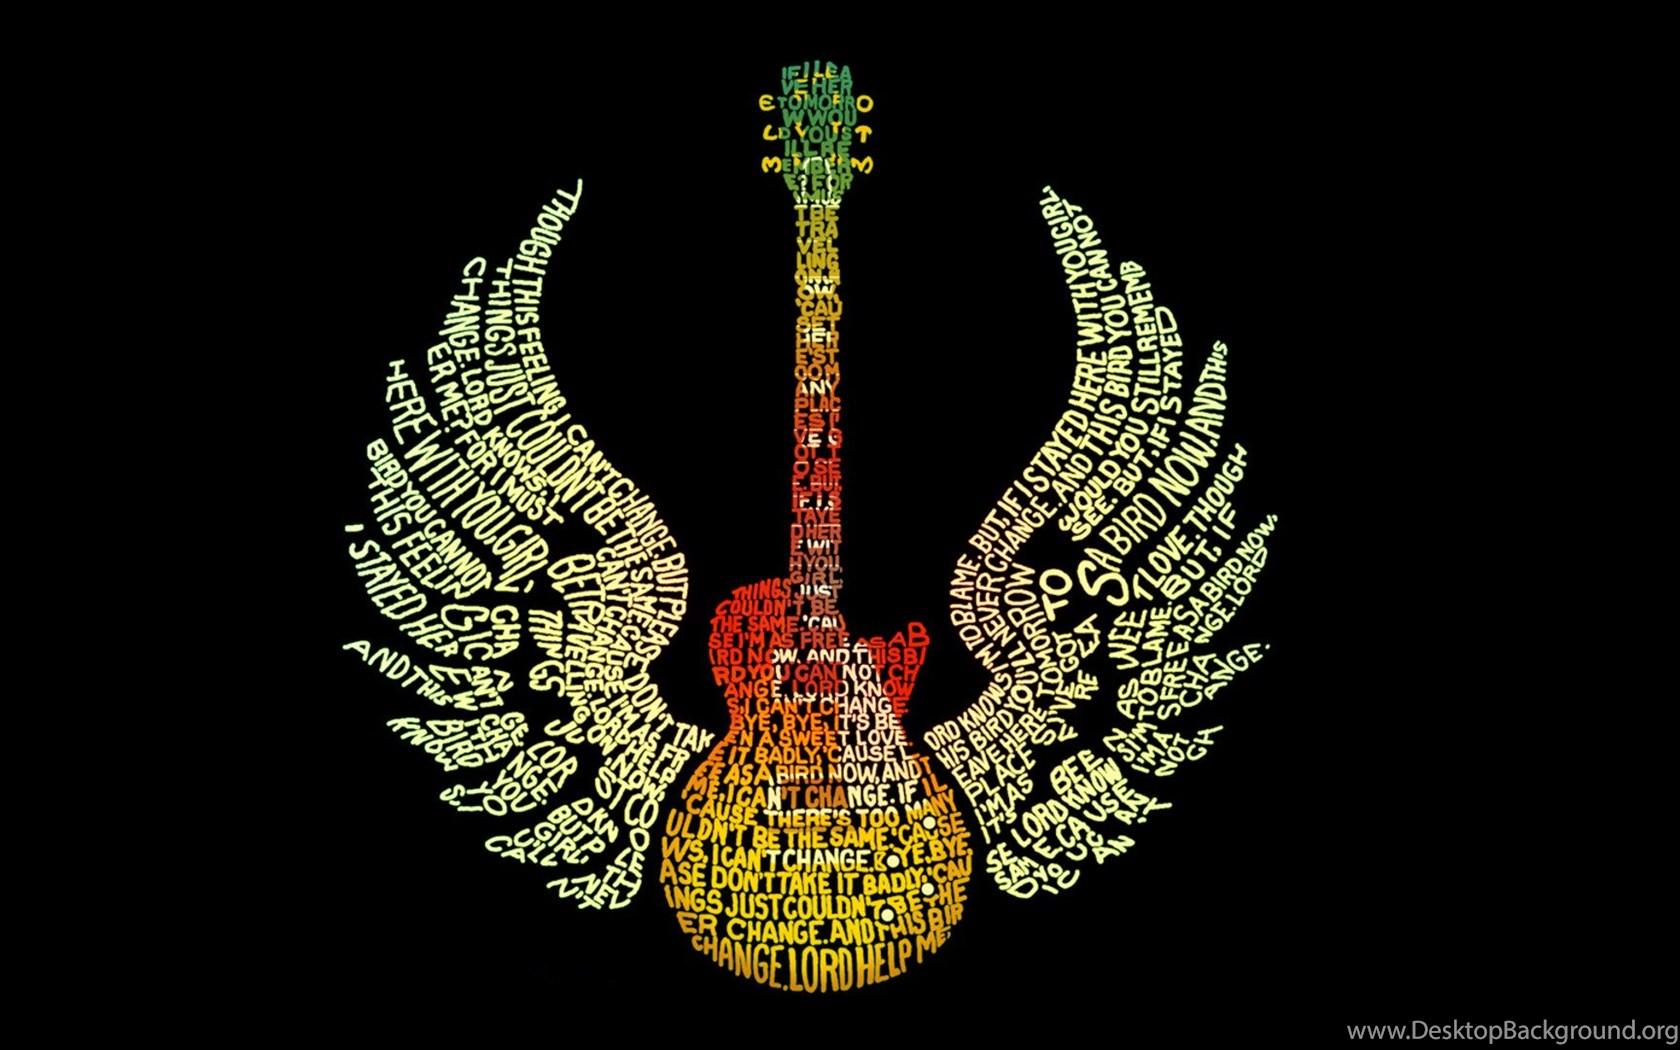 Cool Guitars Wallpapers Guitar Hd Wallpaper 11 Jpg Desktop Background